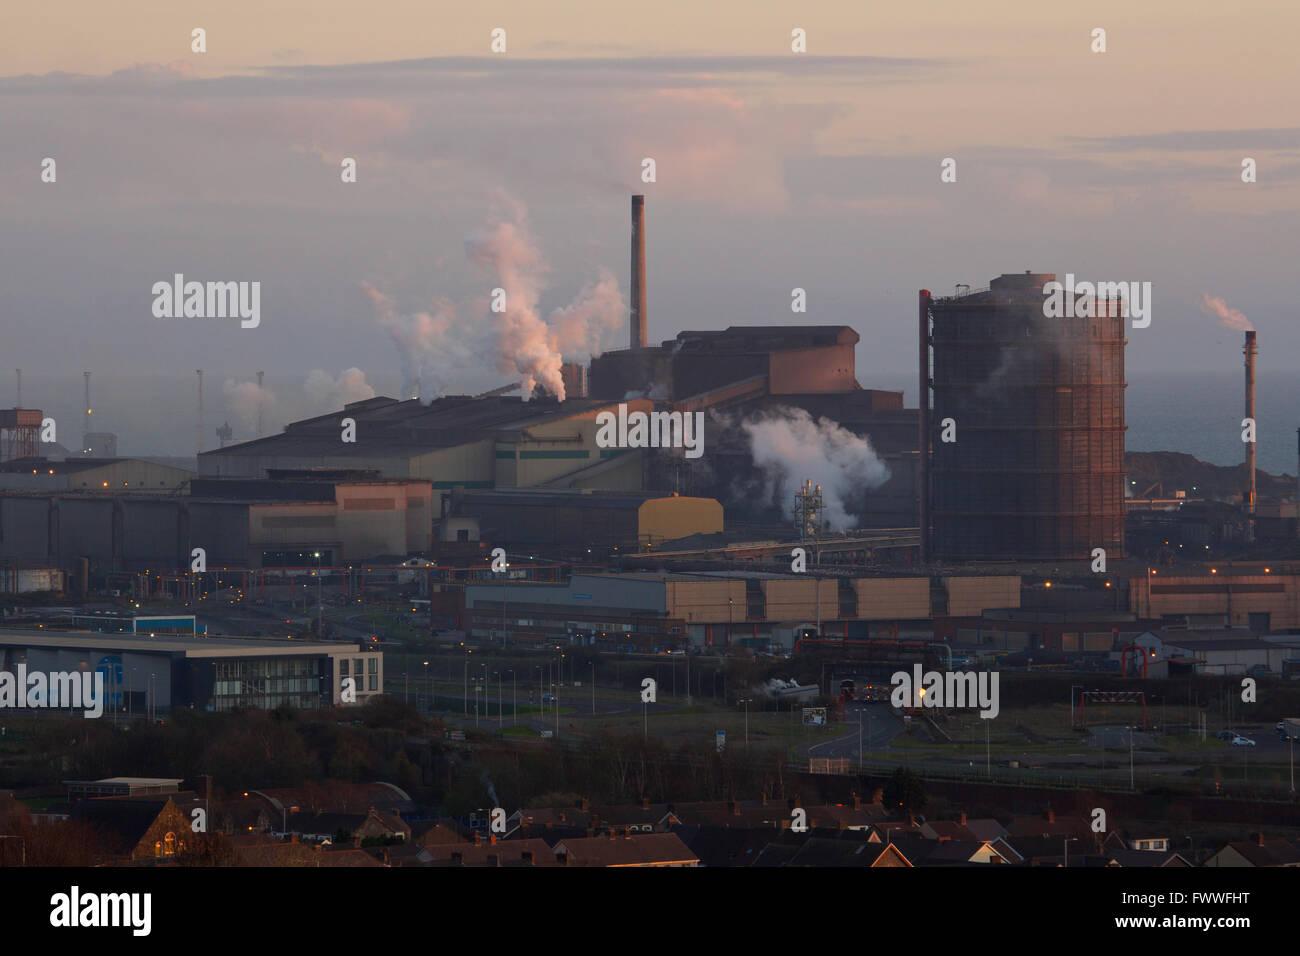 Tata Steel works, Port Talbot, Pays de Galles, Royaume-Uni. Setts Sun sur Tata Steel works, Port Talbot. Banque D'Images